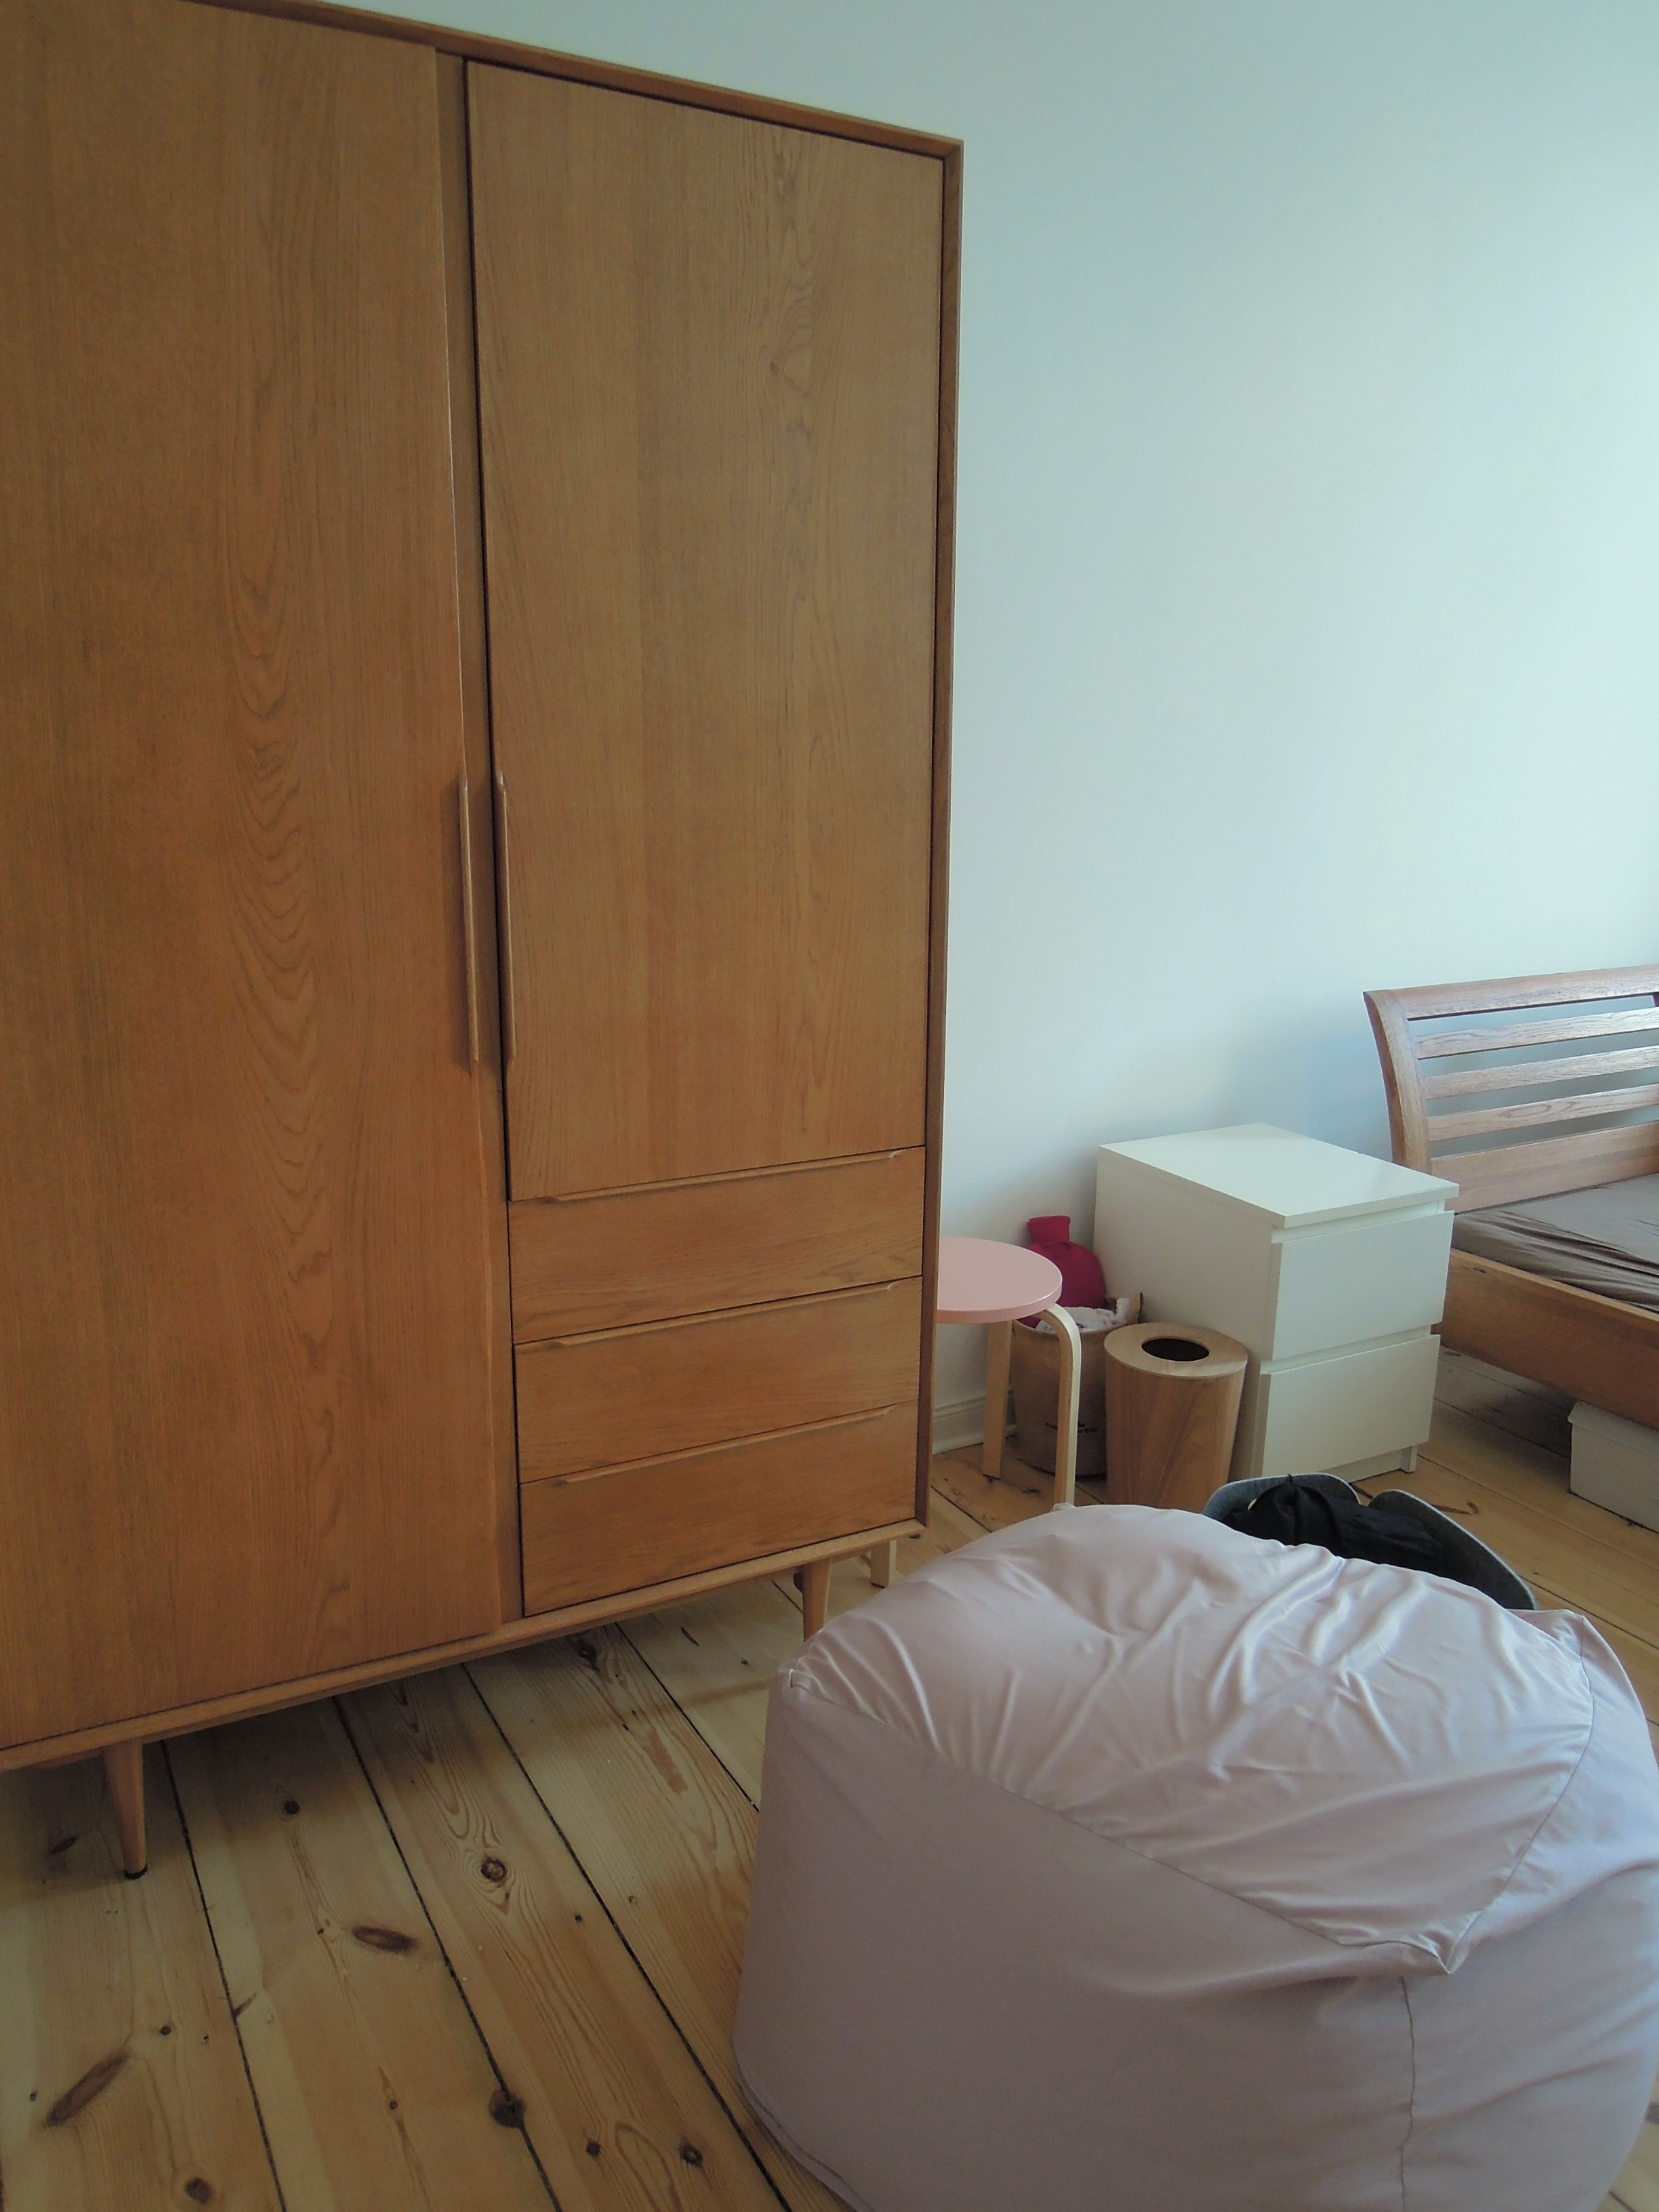 maison du monde deutschland interesting maison du monde deutschland filiale with maison du. Black Bedroom Furniture Sets. Home Design Ideas